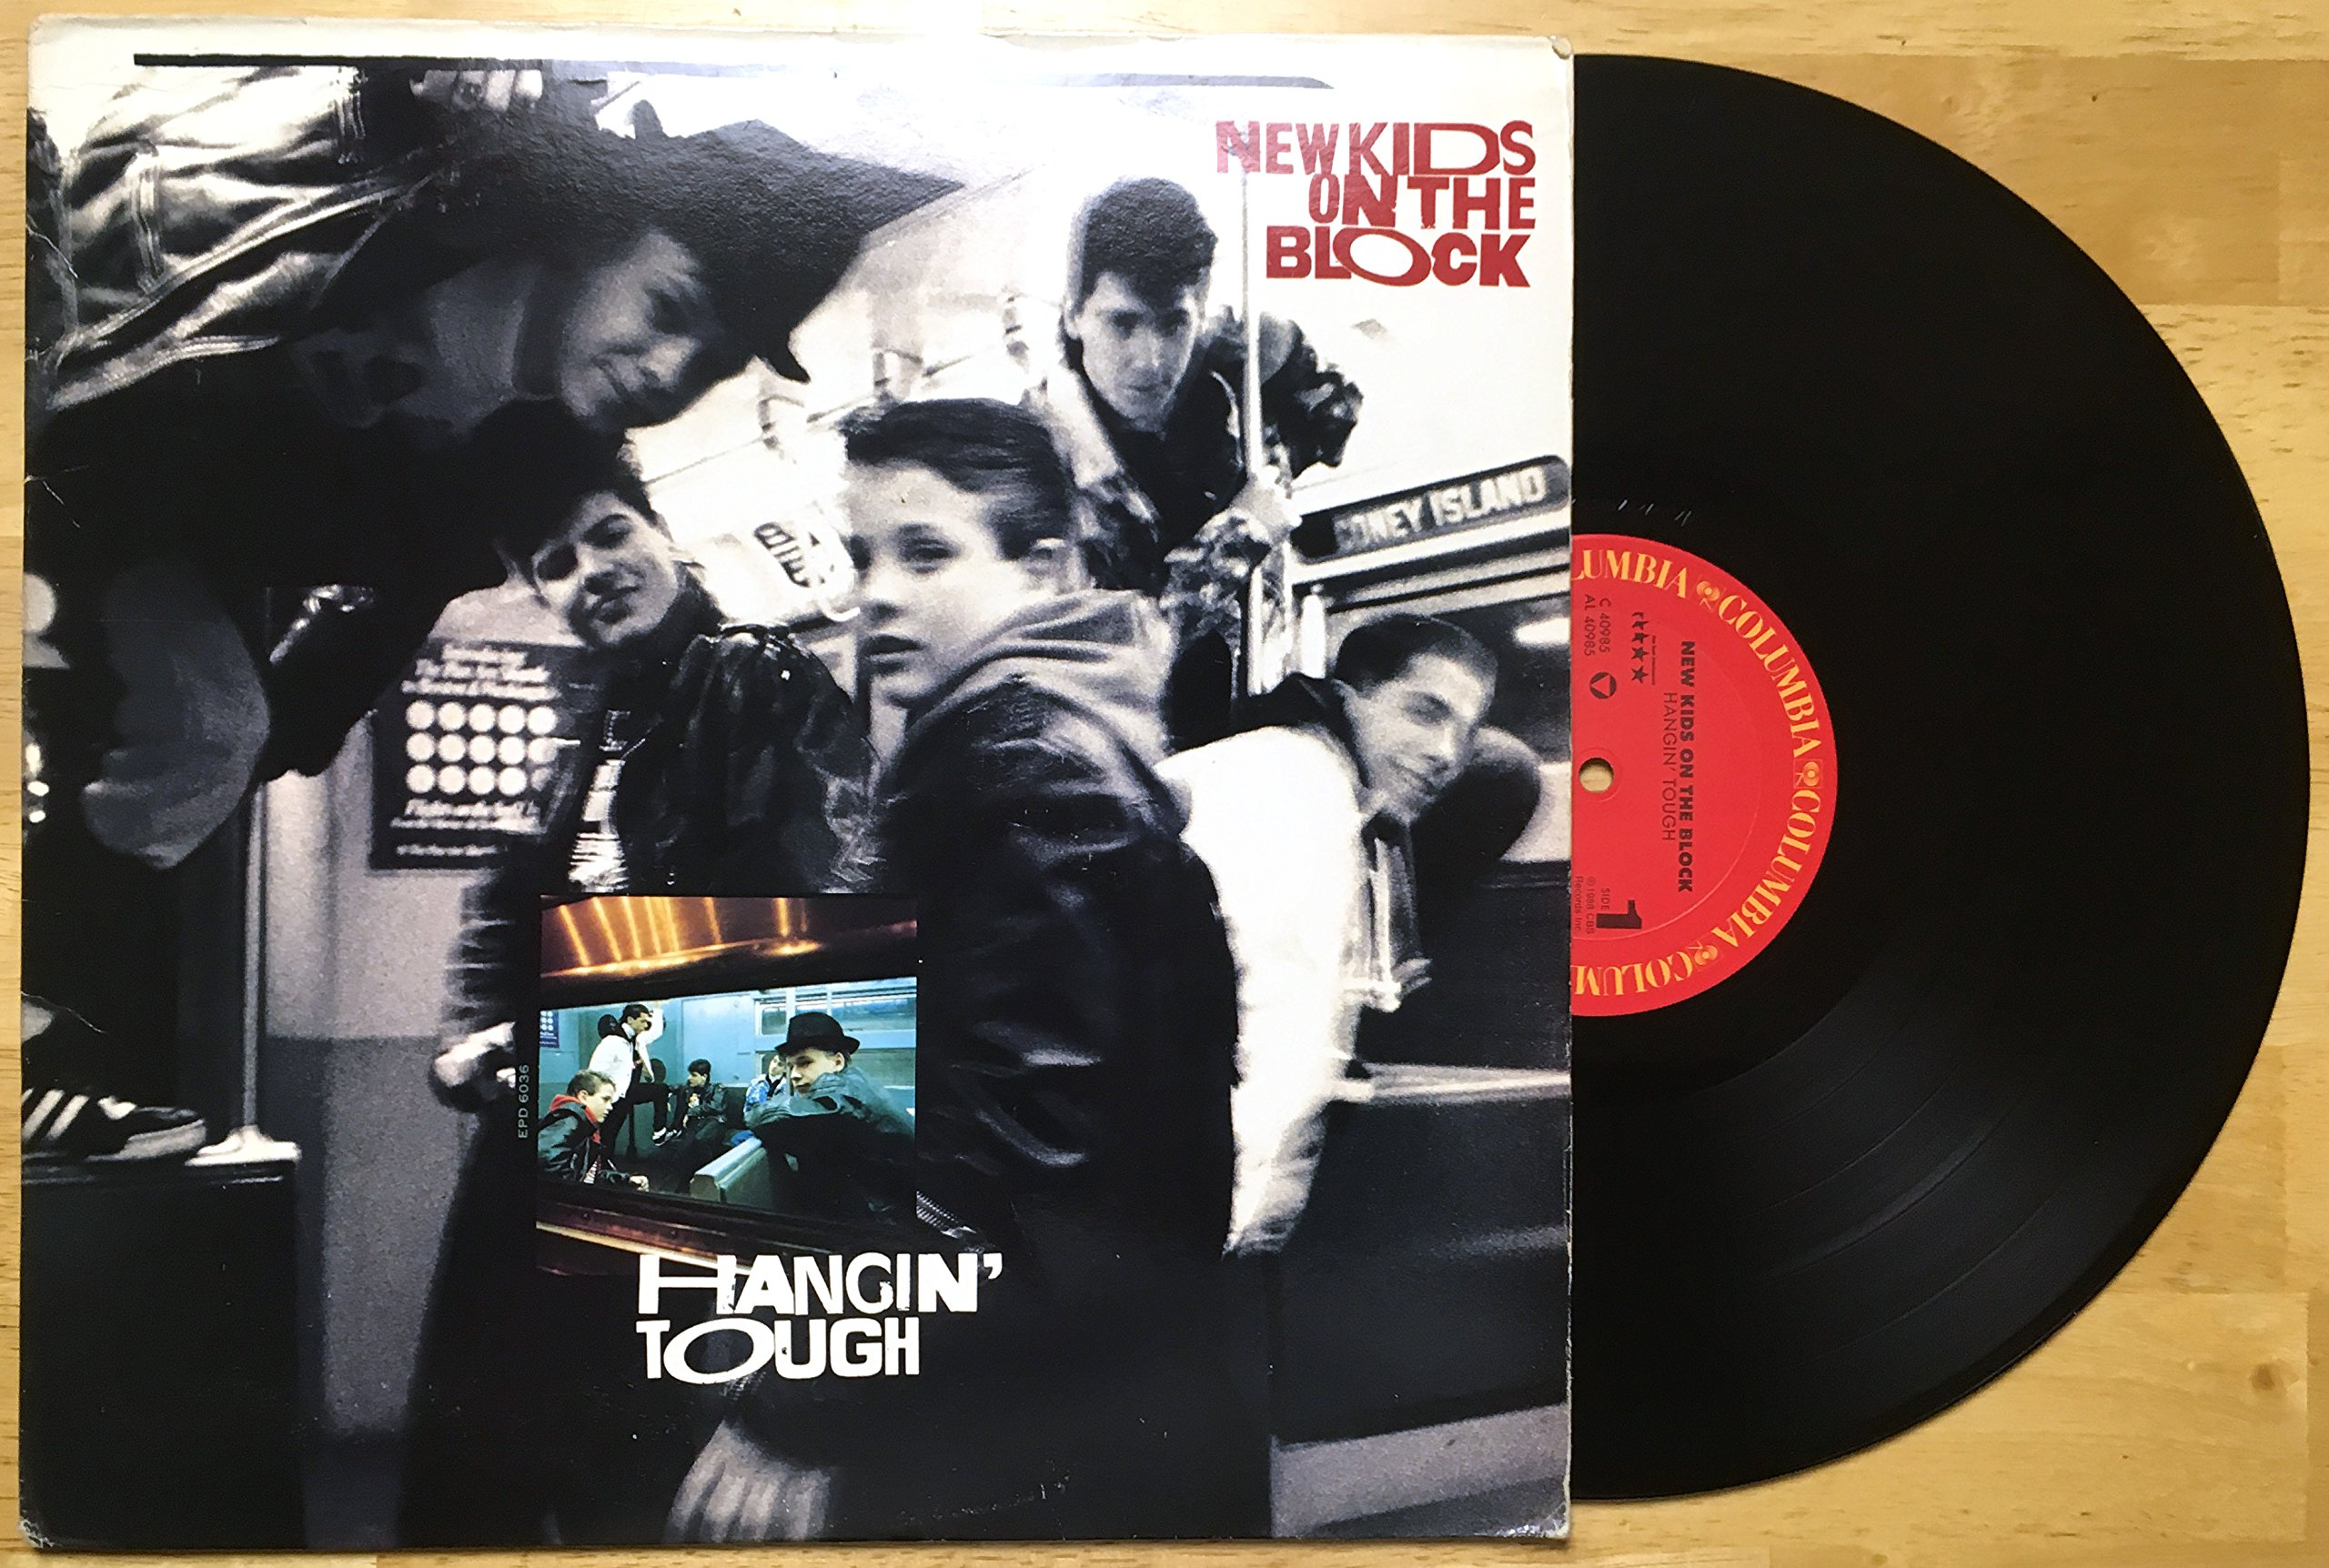 Hangin' Tough [Vinyl] by CBS / Columbia